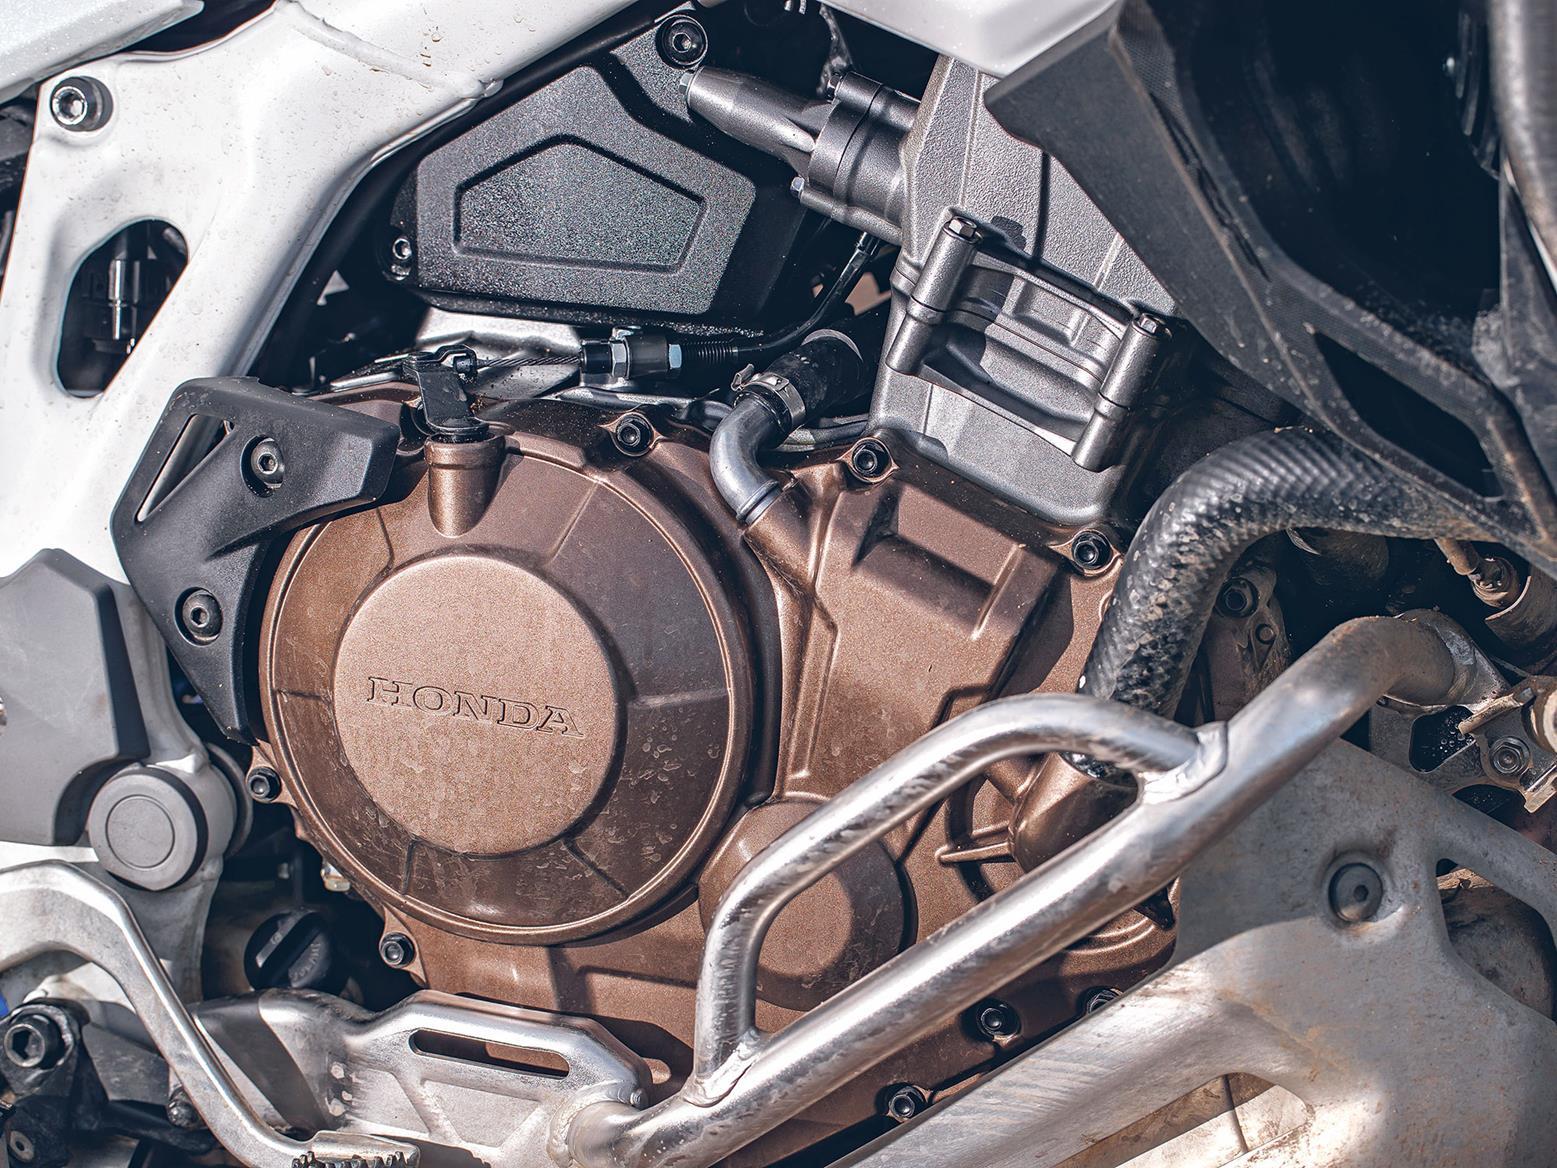 Honda Africa Twin AS ES Plus engine